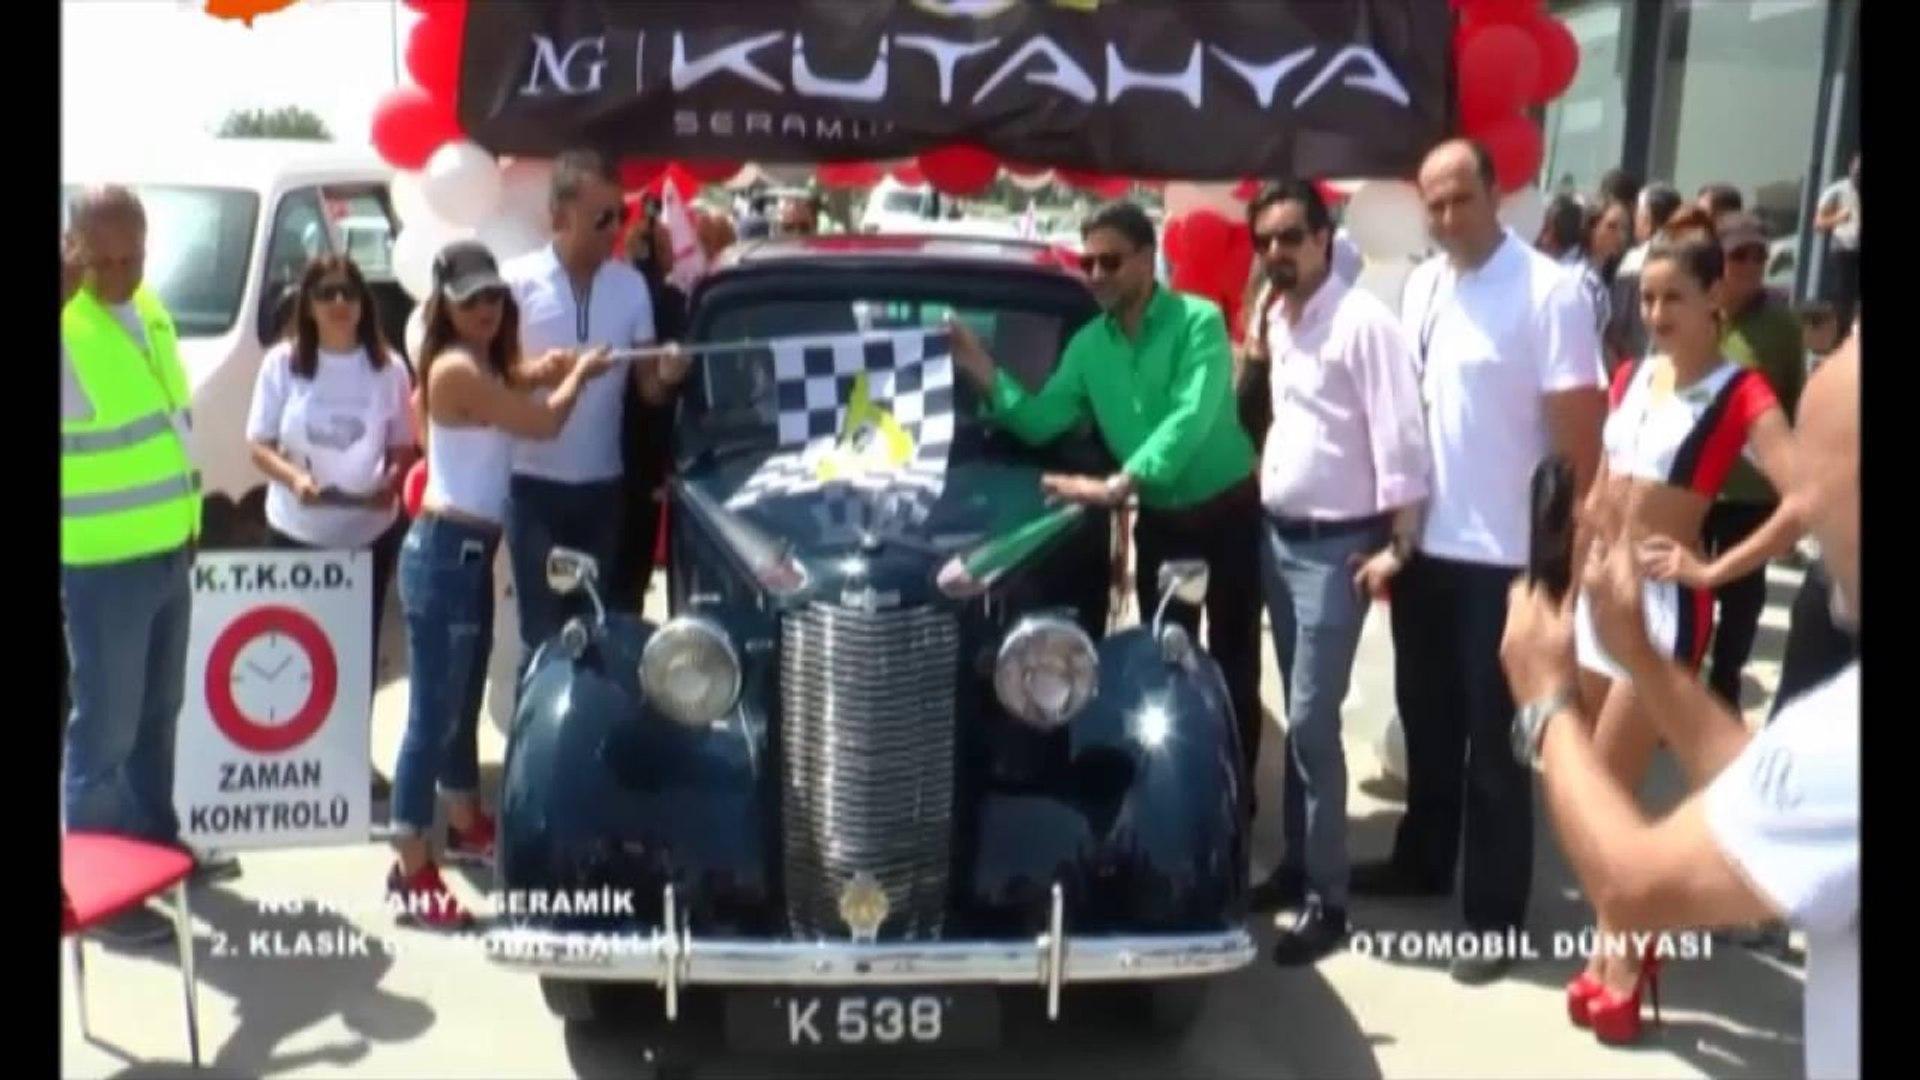 Otomobil Dünyası - Kütahya Seramik Klasik Otomobil Yarışı - 05.05.2016